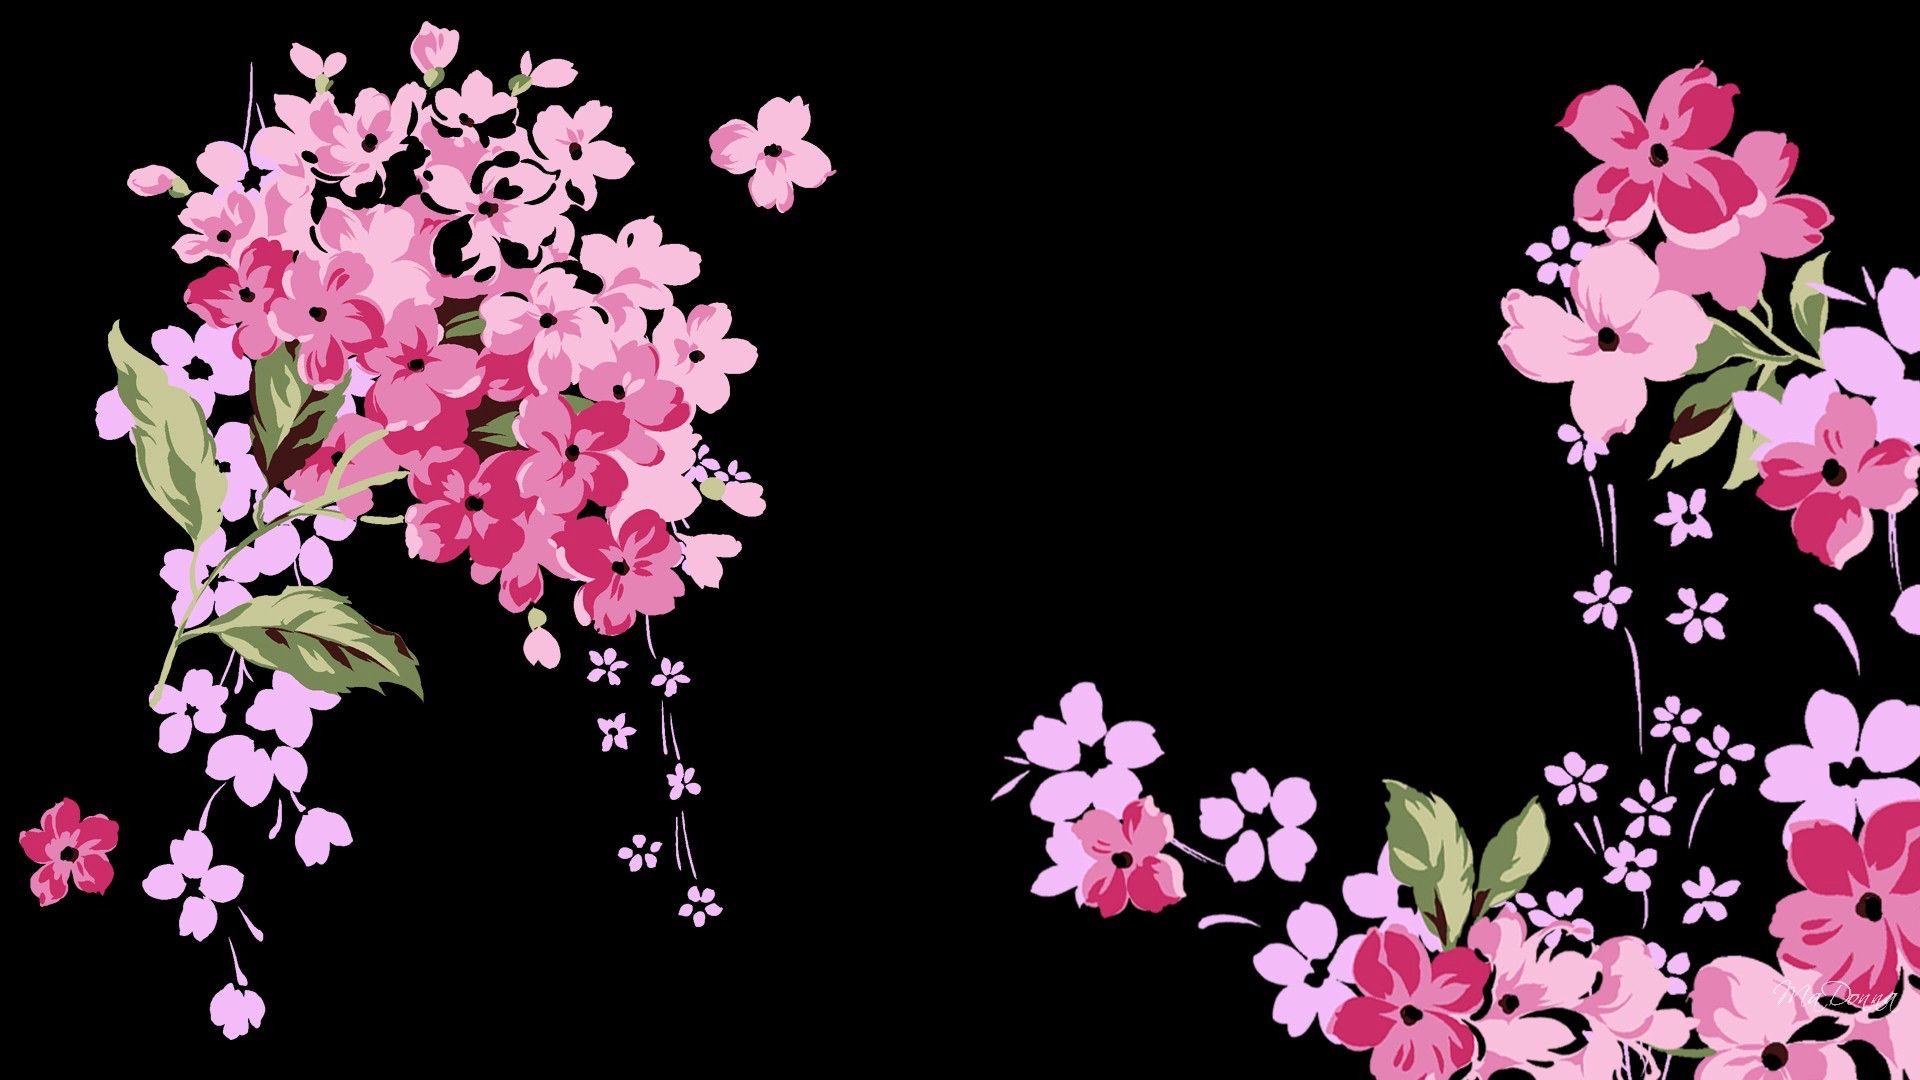 Pin By Julia Hart On Black Wallpaper Pink Floral Wallpaper Black Floral Wallpaper Floral Wallpaper Desktop